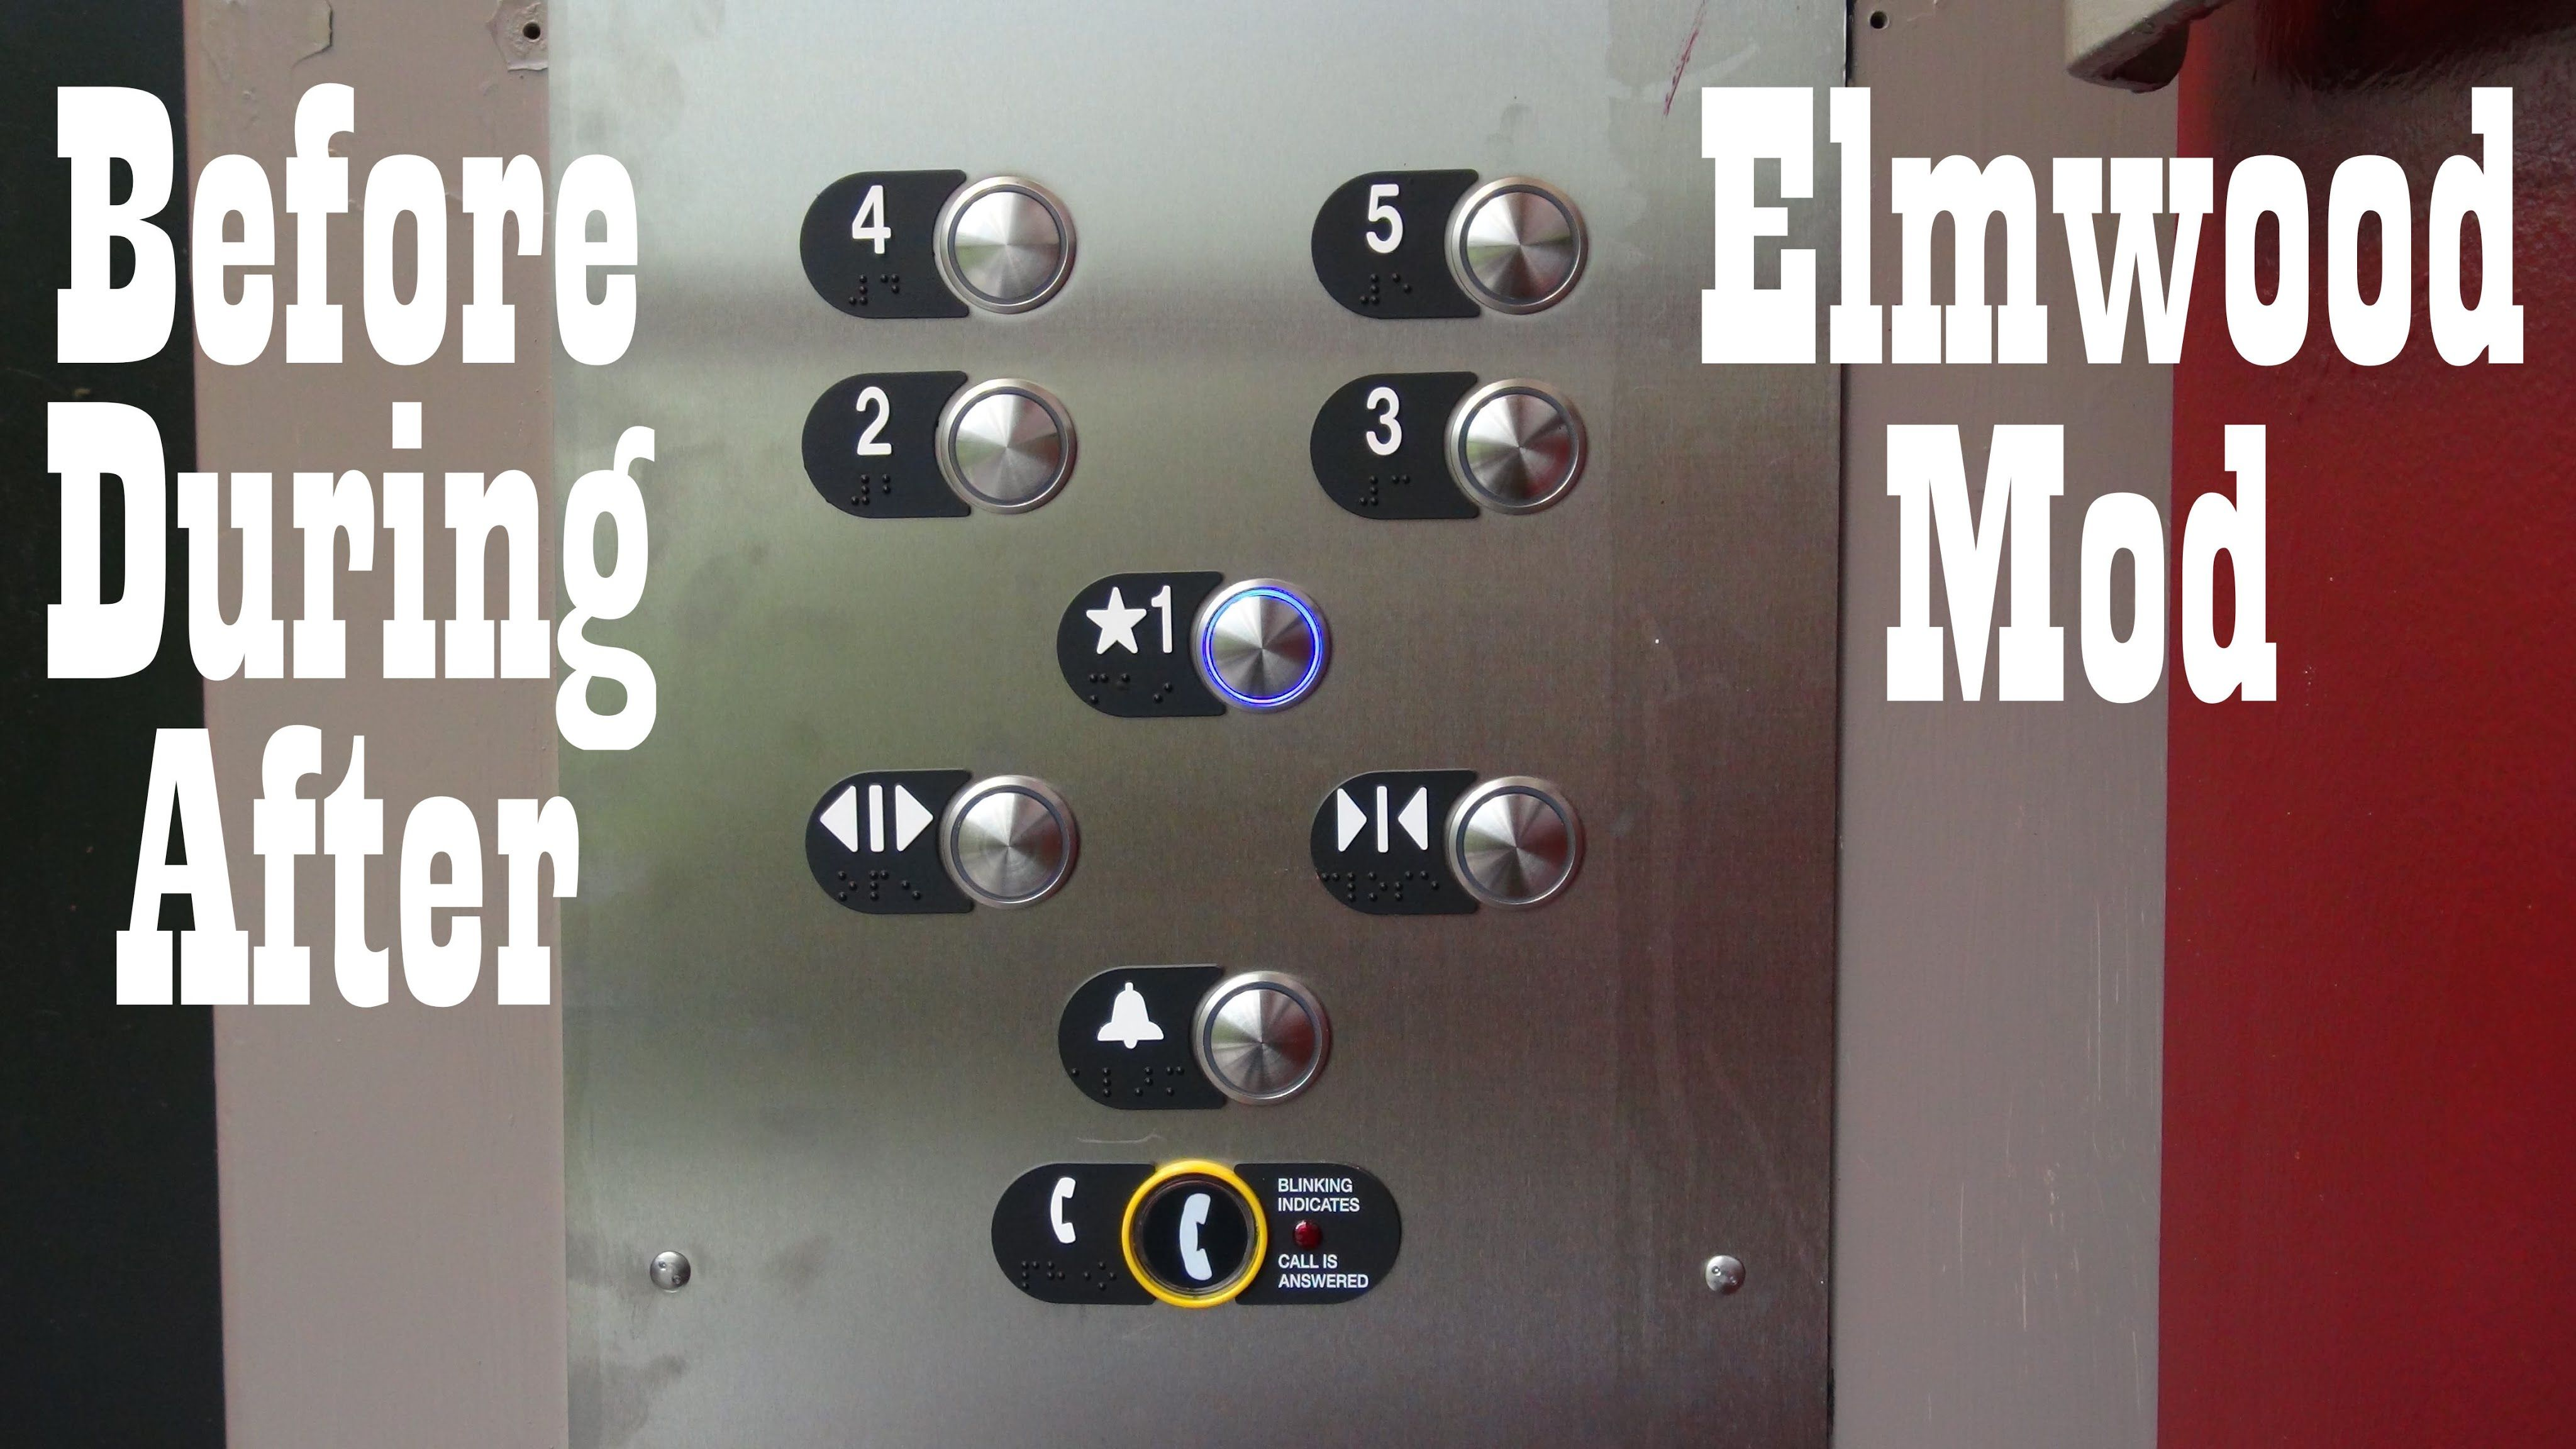 Elmwood park garage elevator before during and after the mod